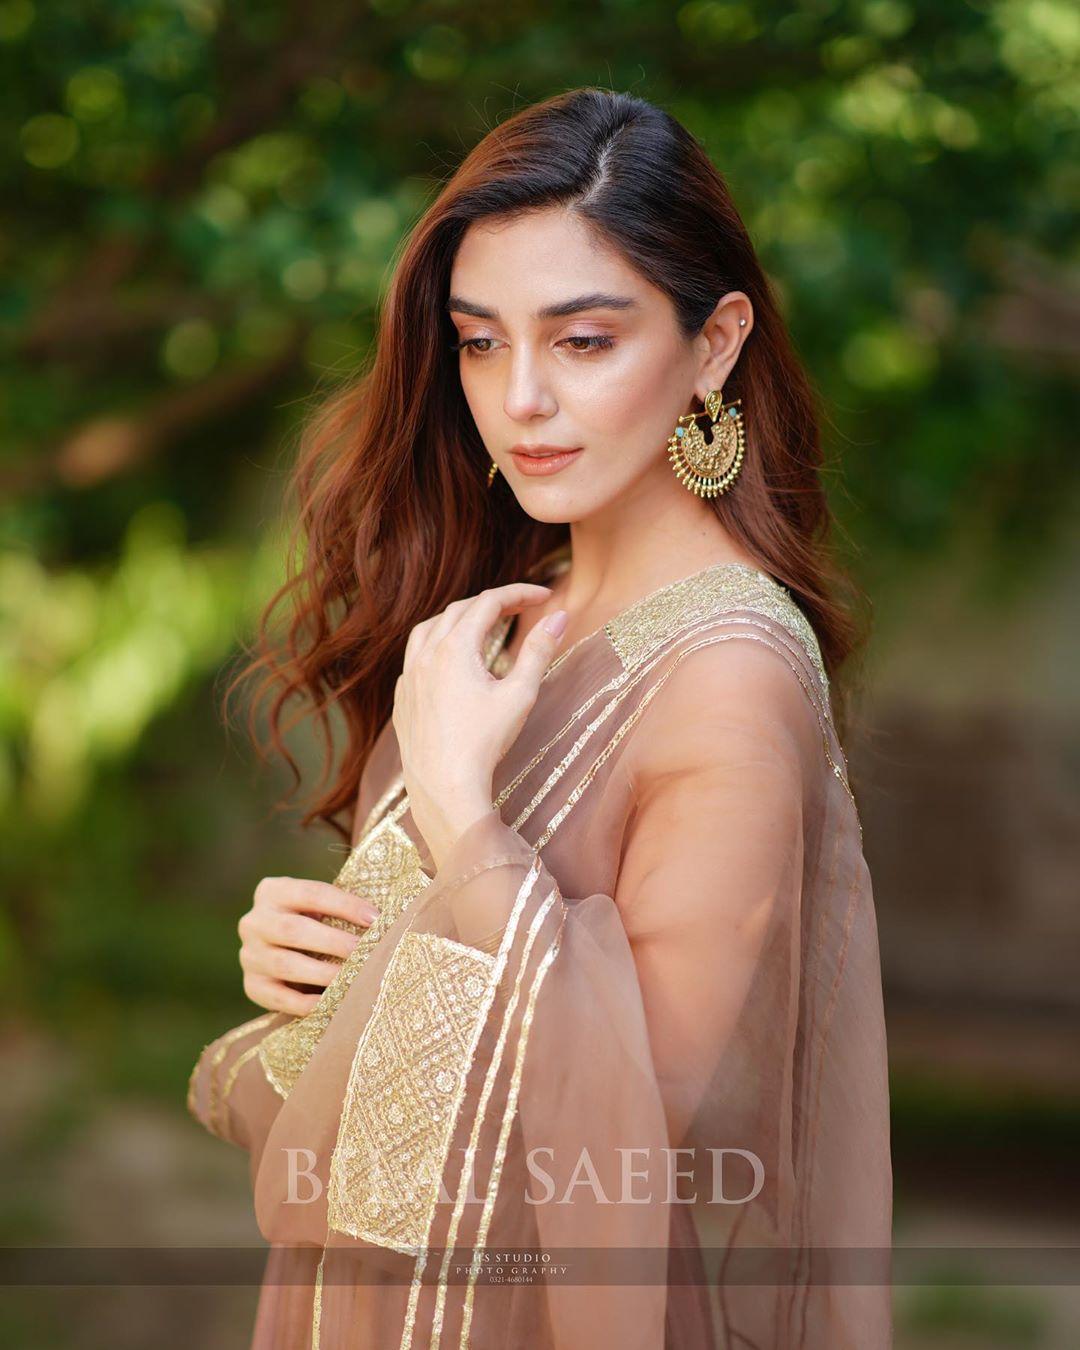 Maya Ali Looking Gorgeous in White Dress